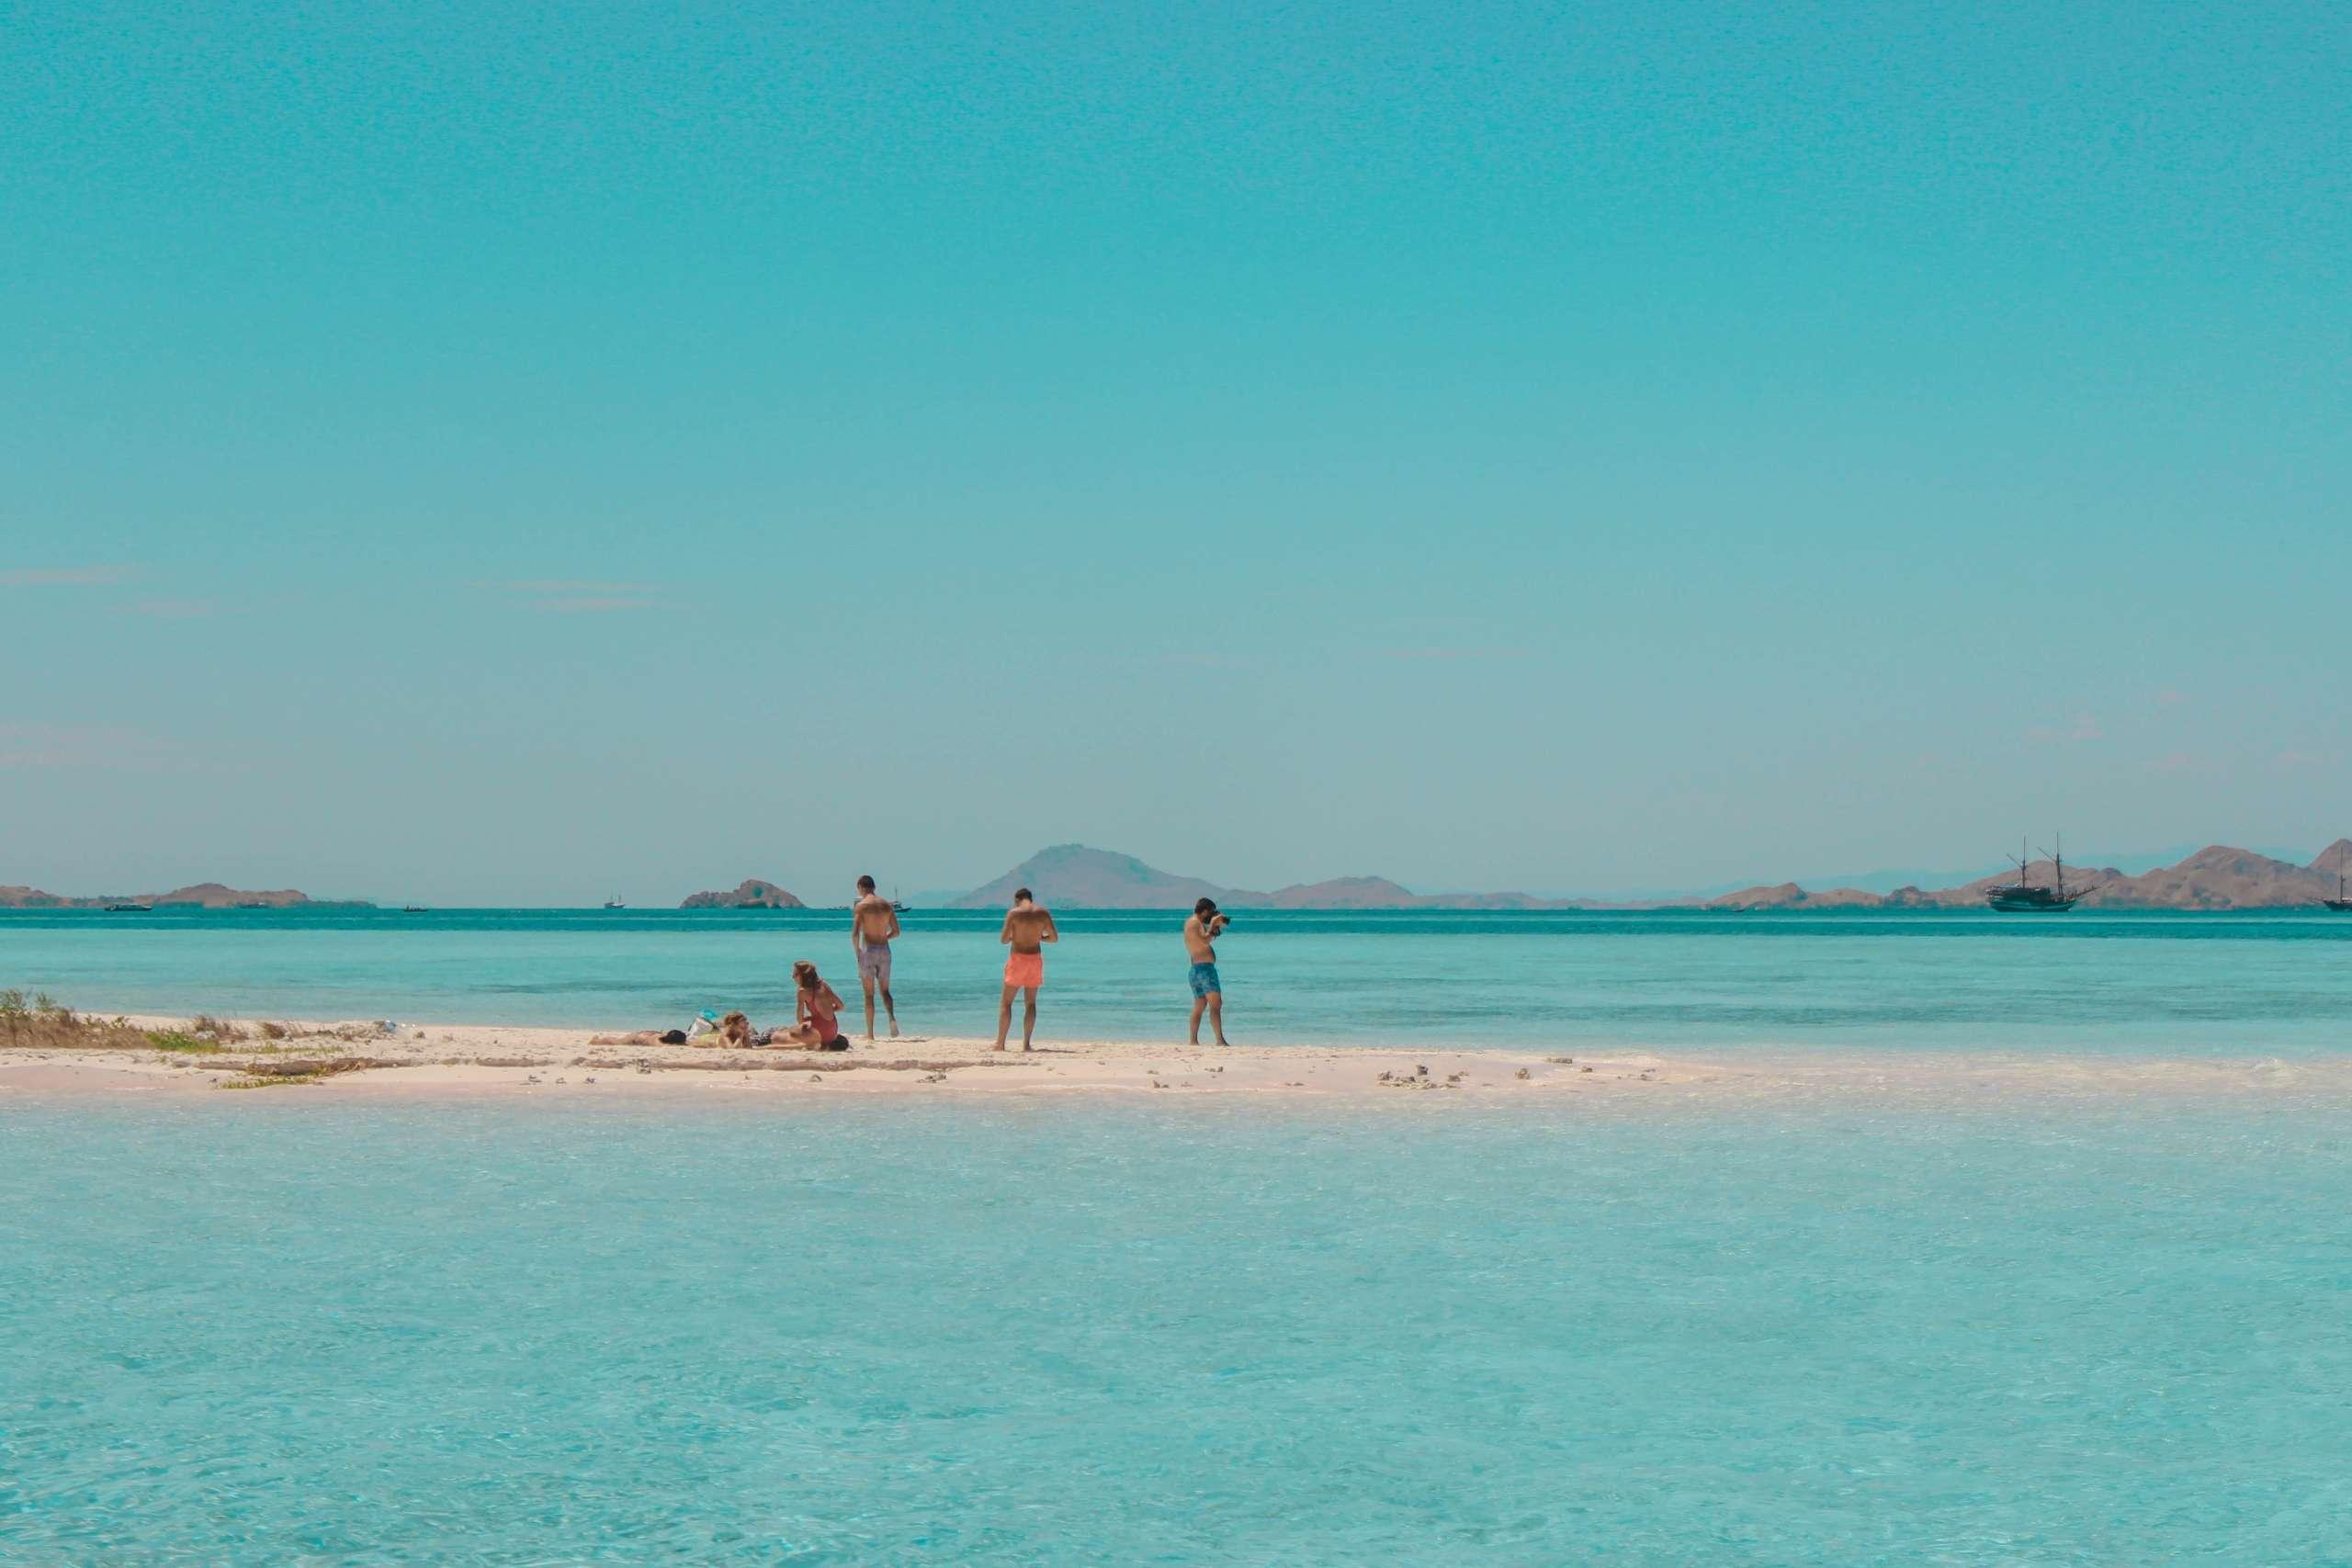 Viaje Sorpresa a la Playa Wish&Fly